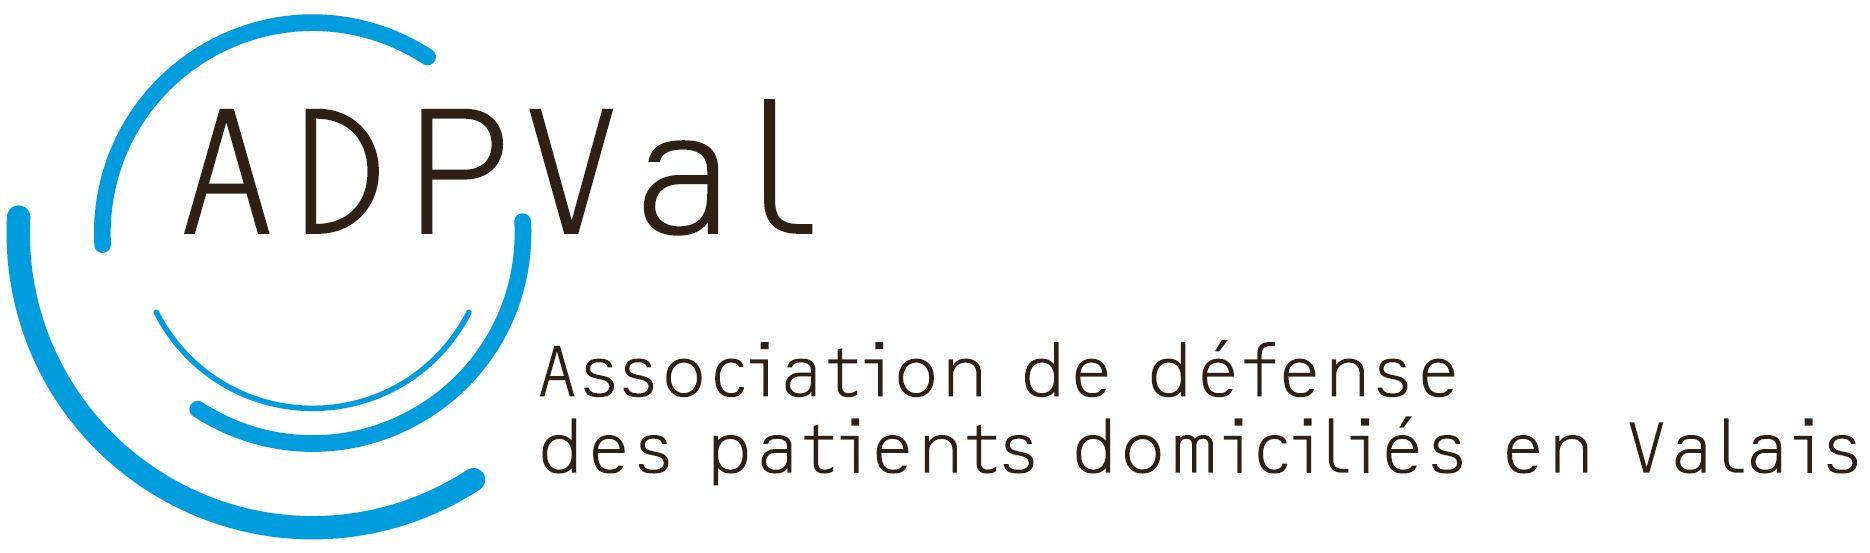 ADPVal